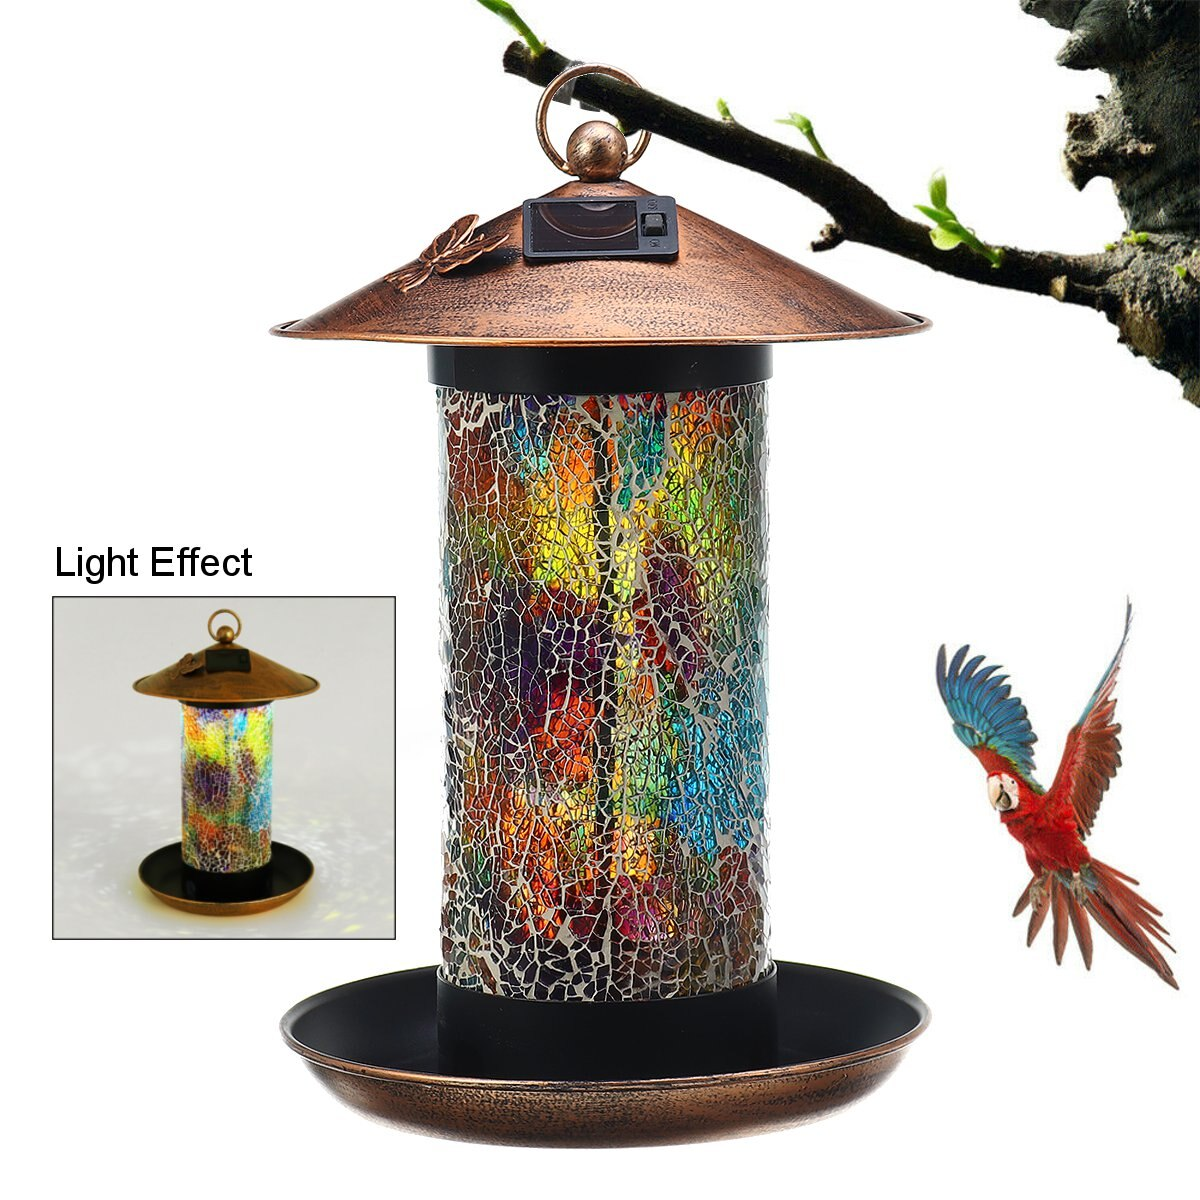 Solar Powered Gazebo Hanging Wild Bird Feeder Solar Lamp Light Garden Outdoor Lamp Patio Balcony Decoration Bird Accessories